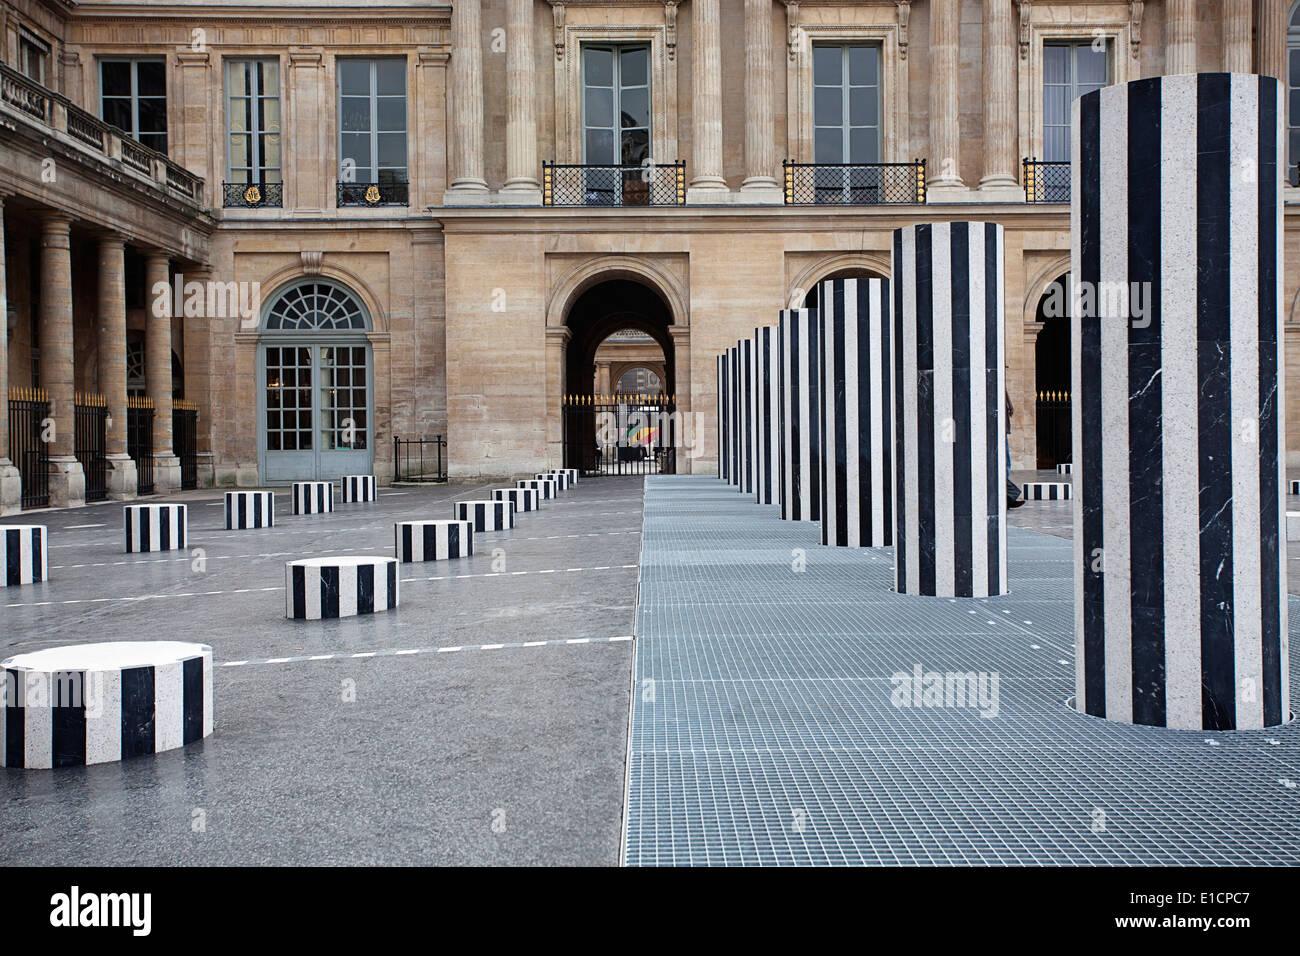 Courtyard in the Palais Royal, Paris - Stock Image